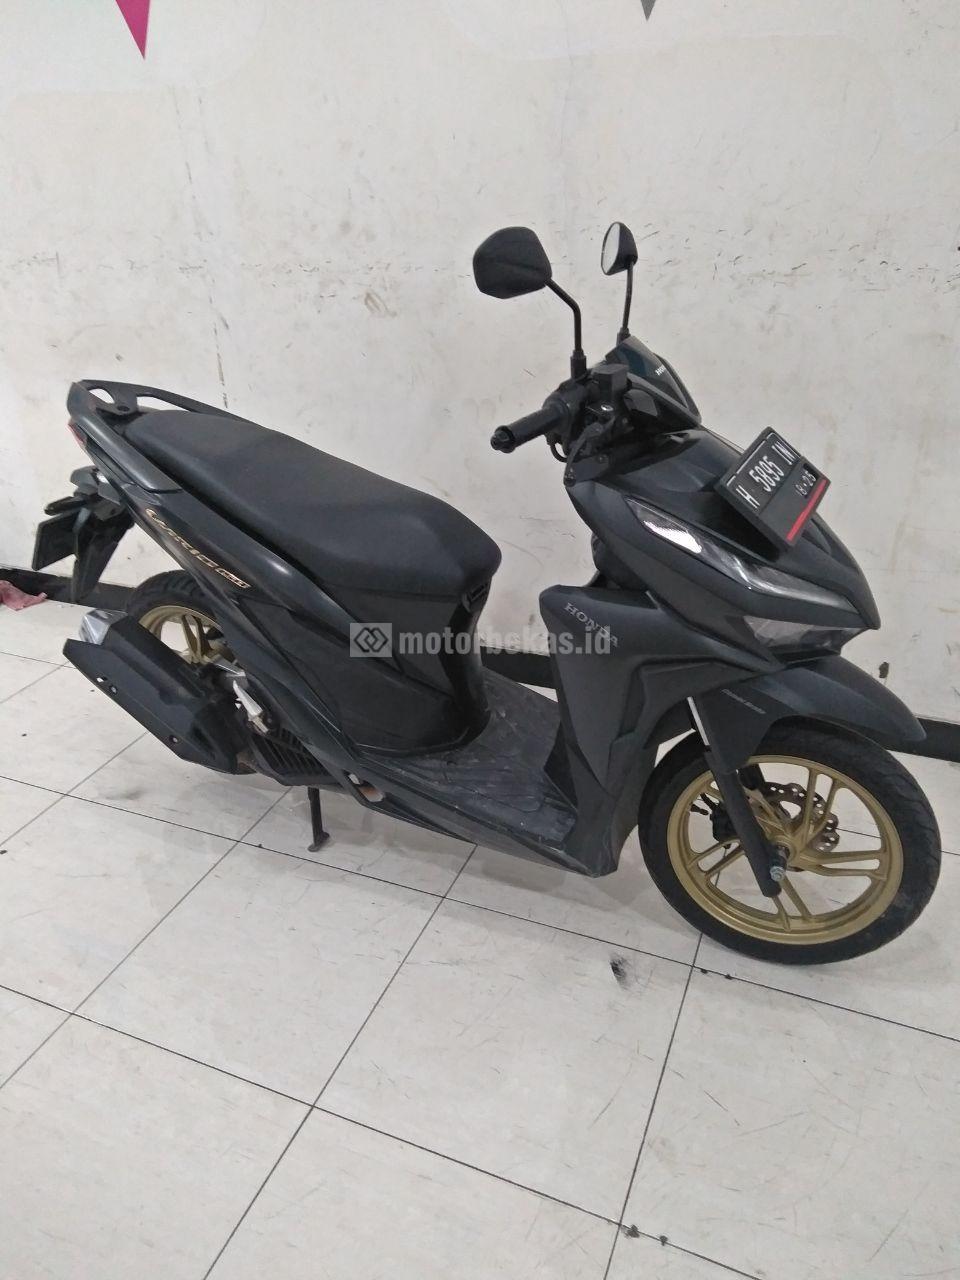 HONDA VARIO 150 SE  3999 motorbekas.id